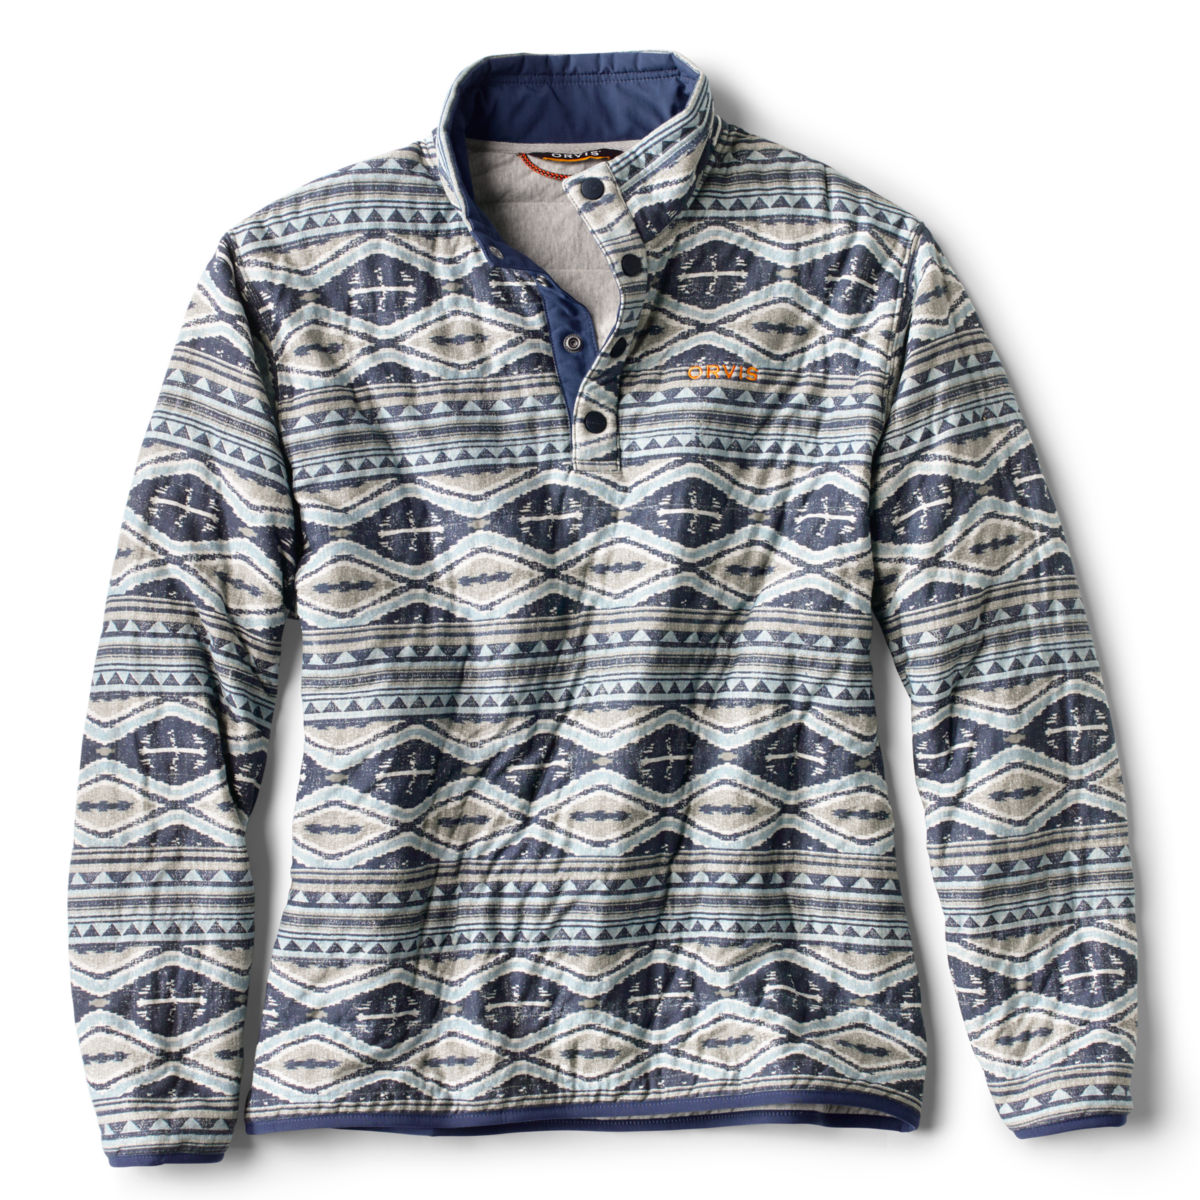 Outdoor Quilted Snap Sweatshirt - BLUE/MULTIimage number 0